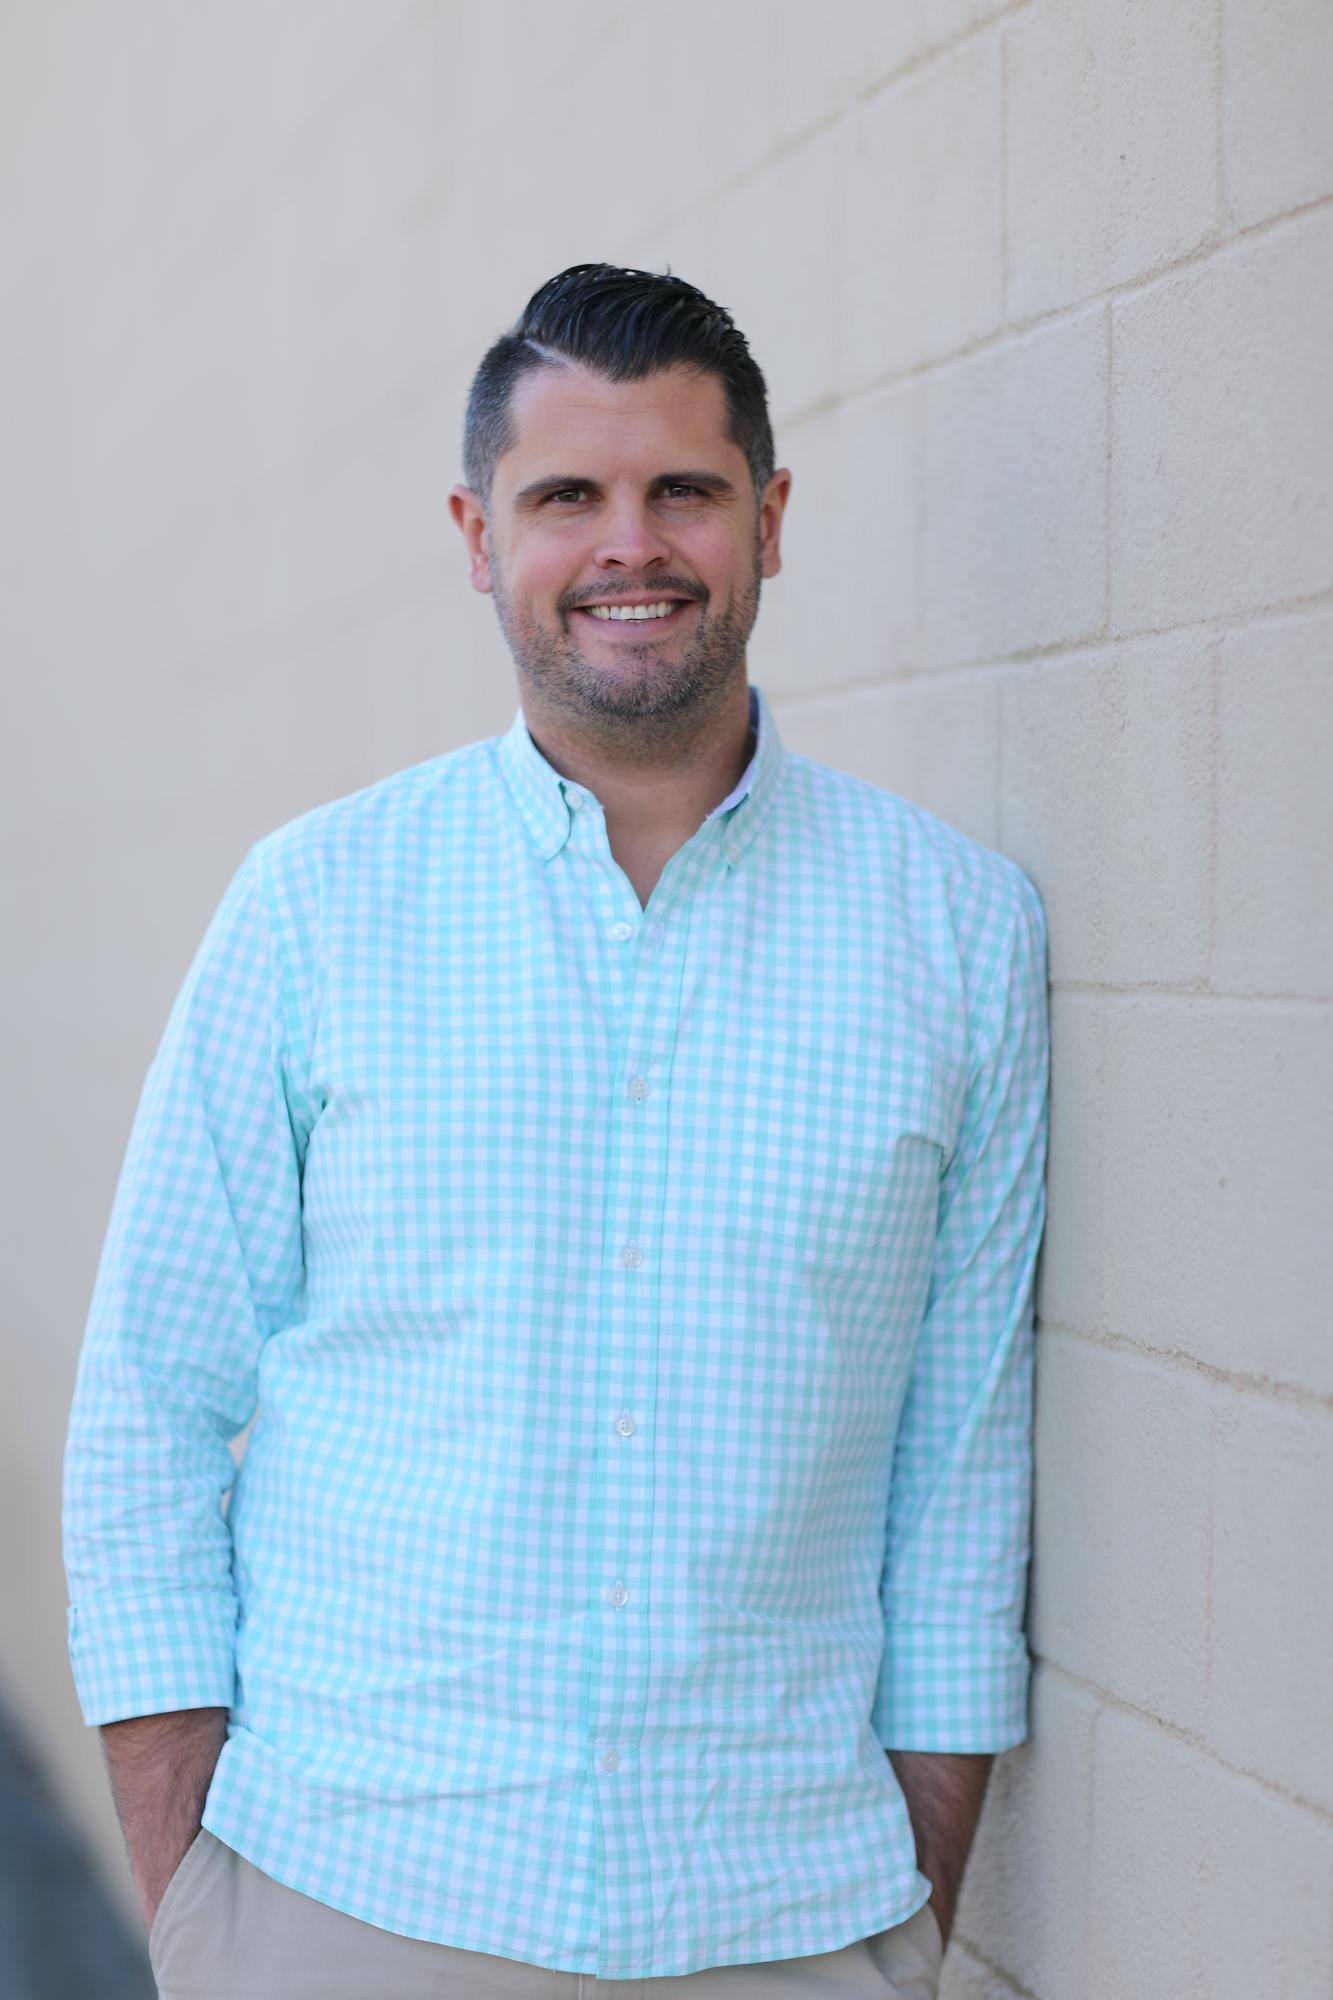 Todd Adcock